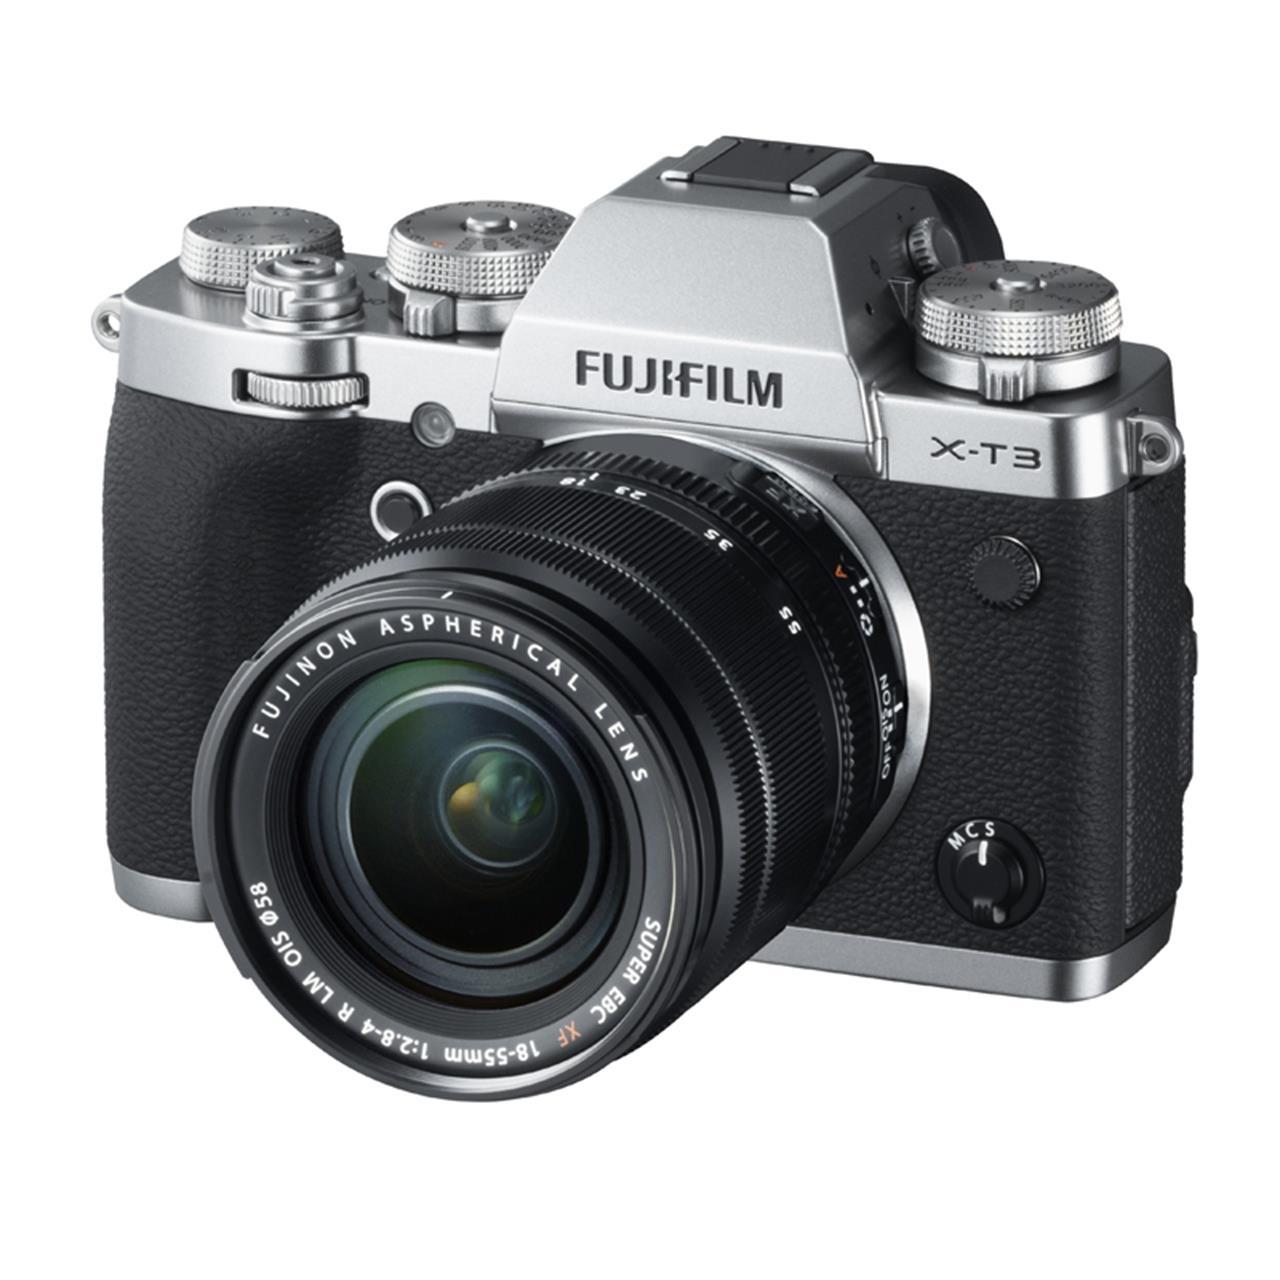 4547410378184__fujifilm_x-t3_silver_18-55mm_hofma.jpg